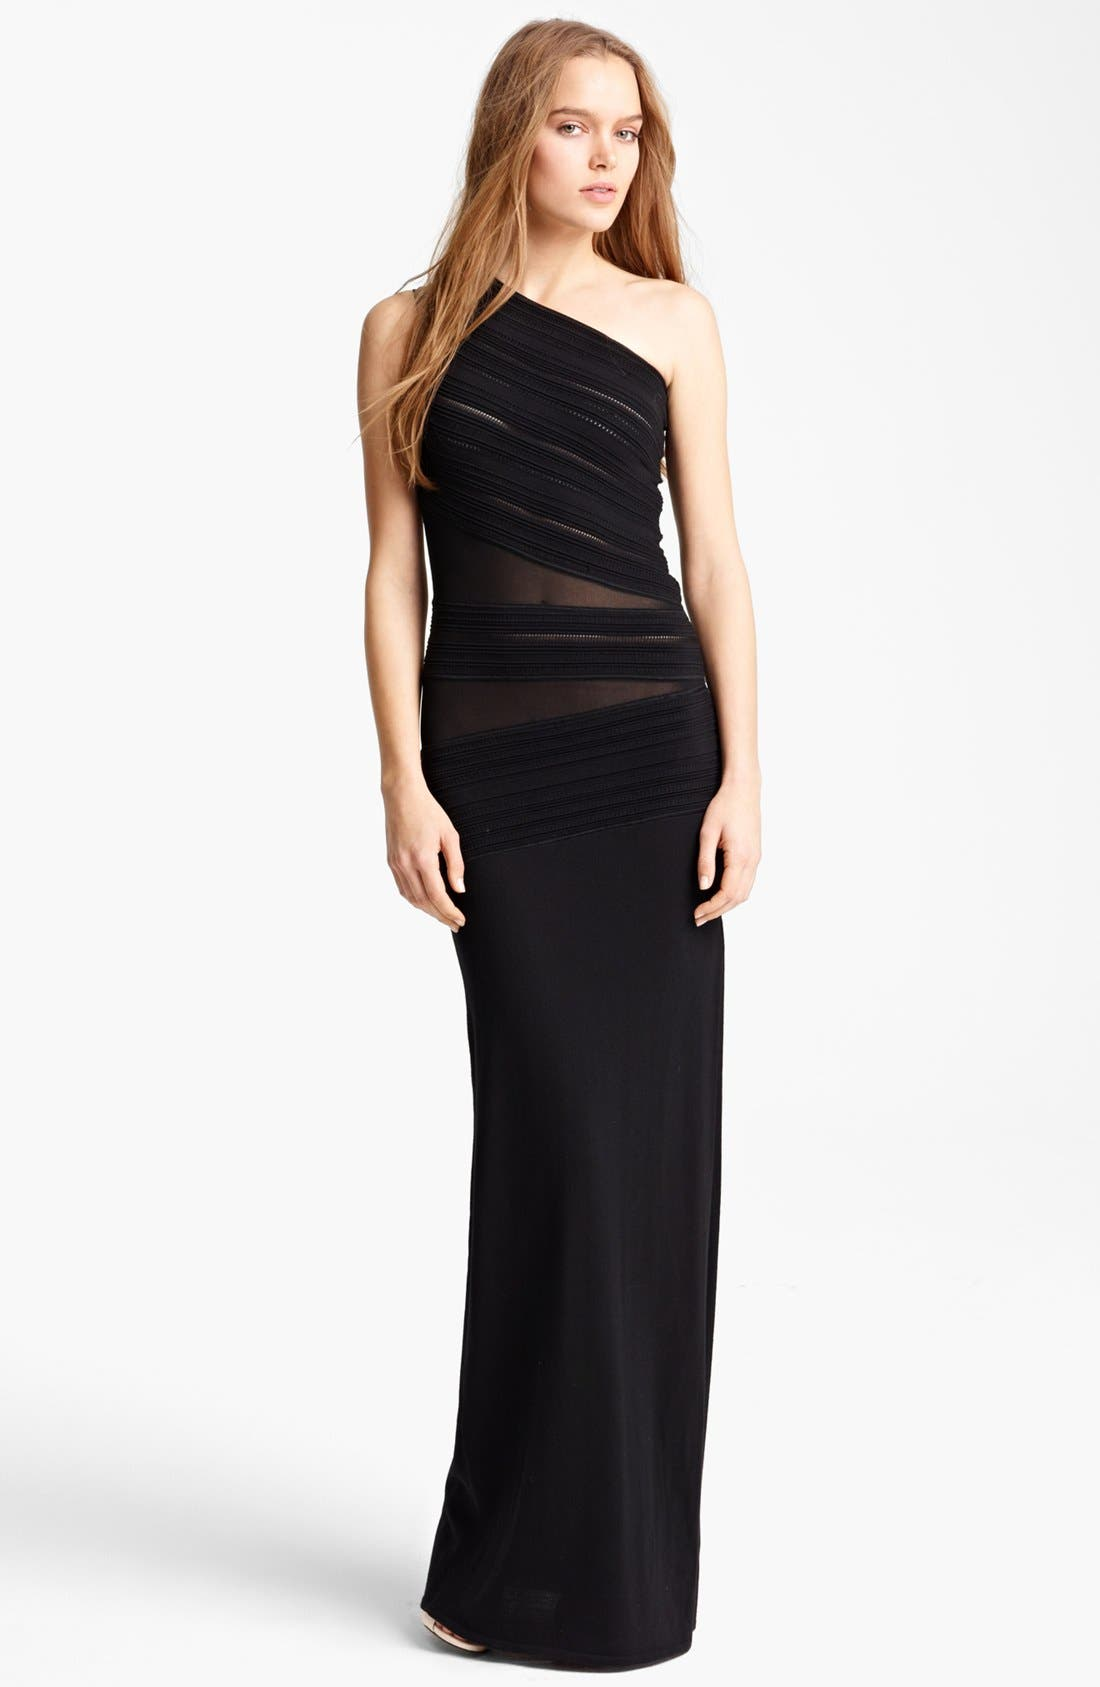 Main Image - Roberto Cavalli Sheer Inset One Shoulder Gown